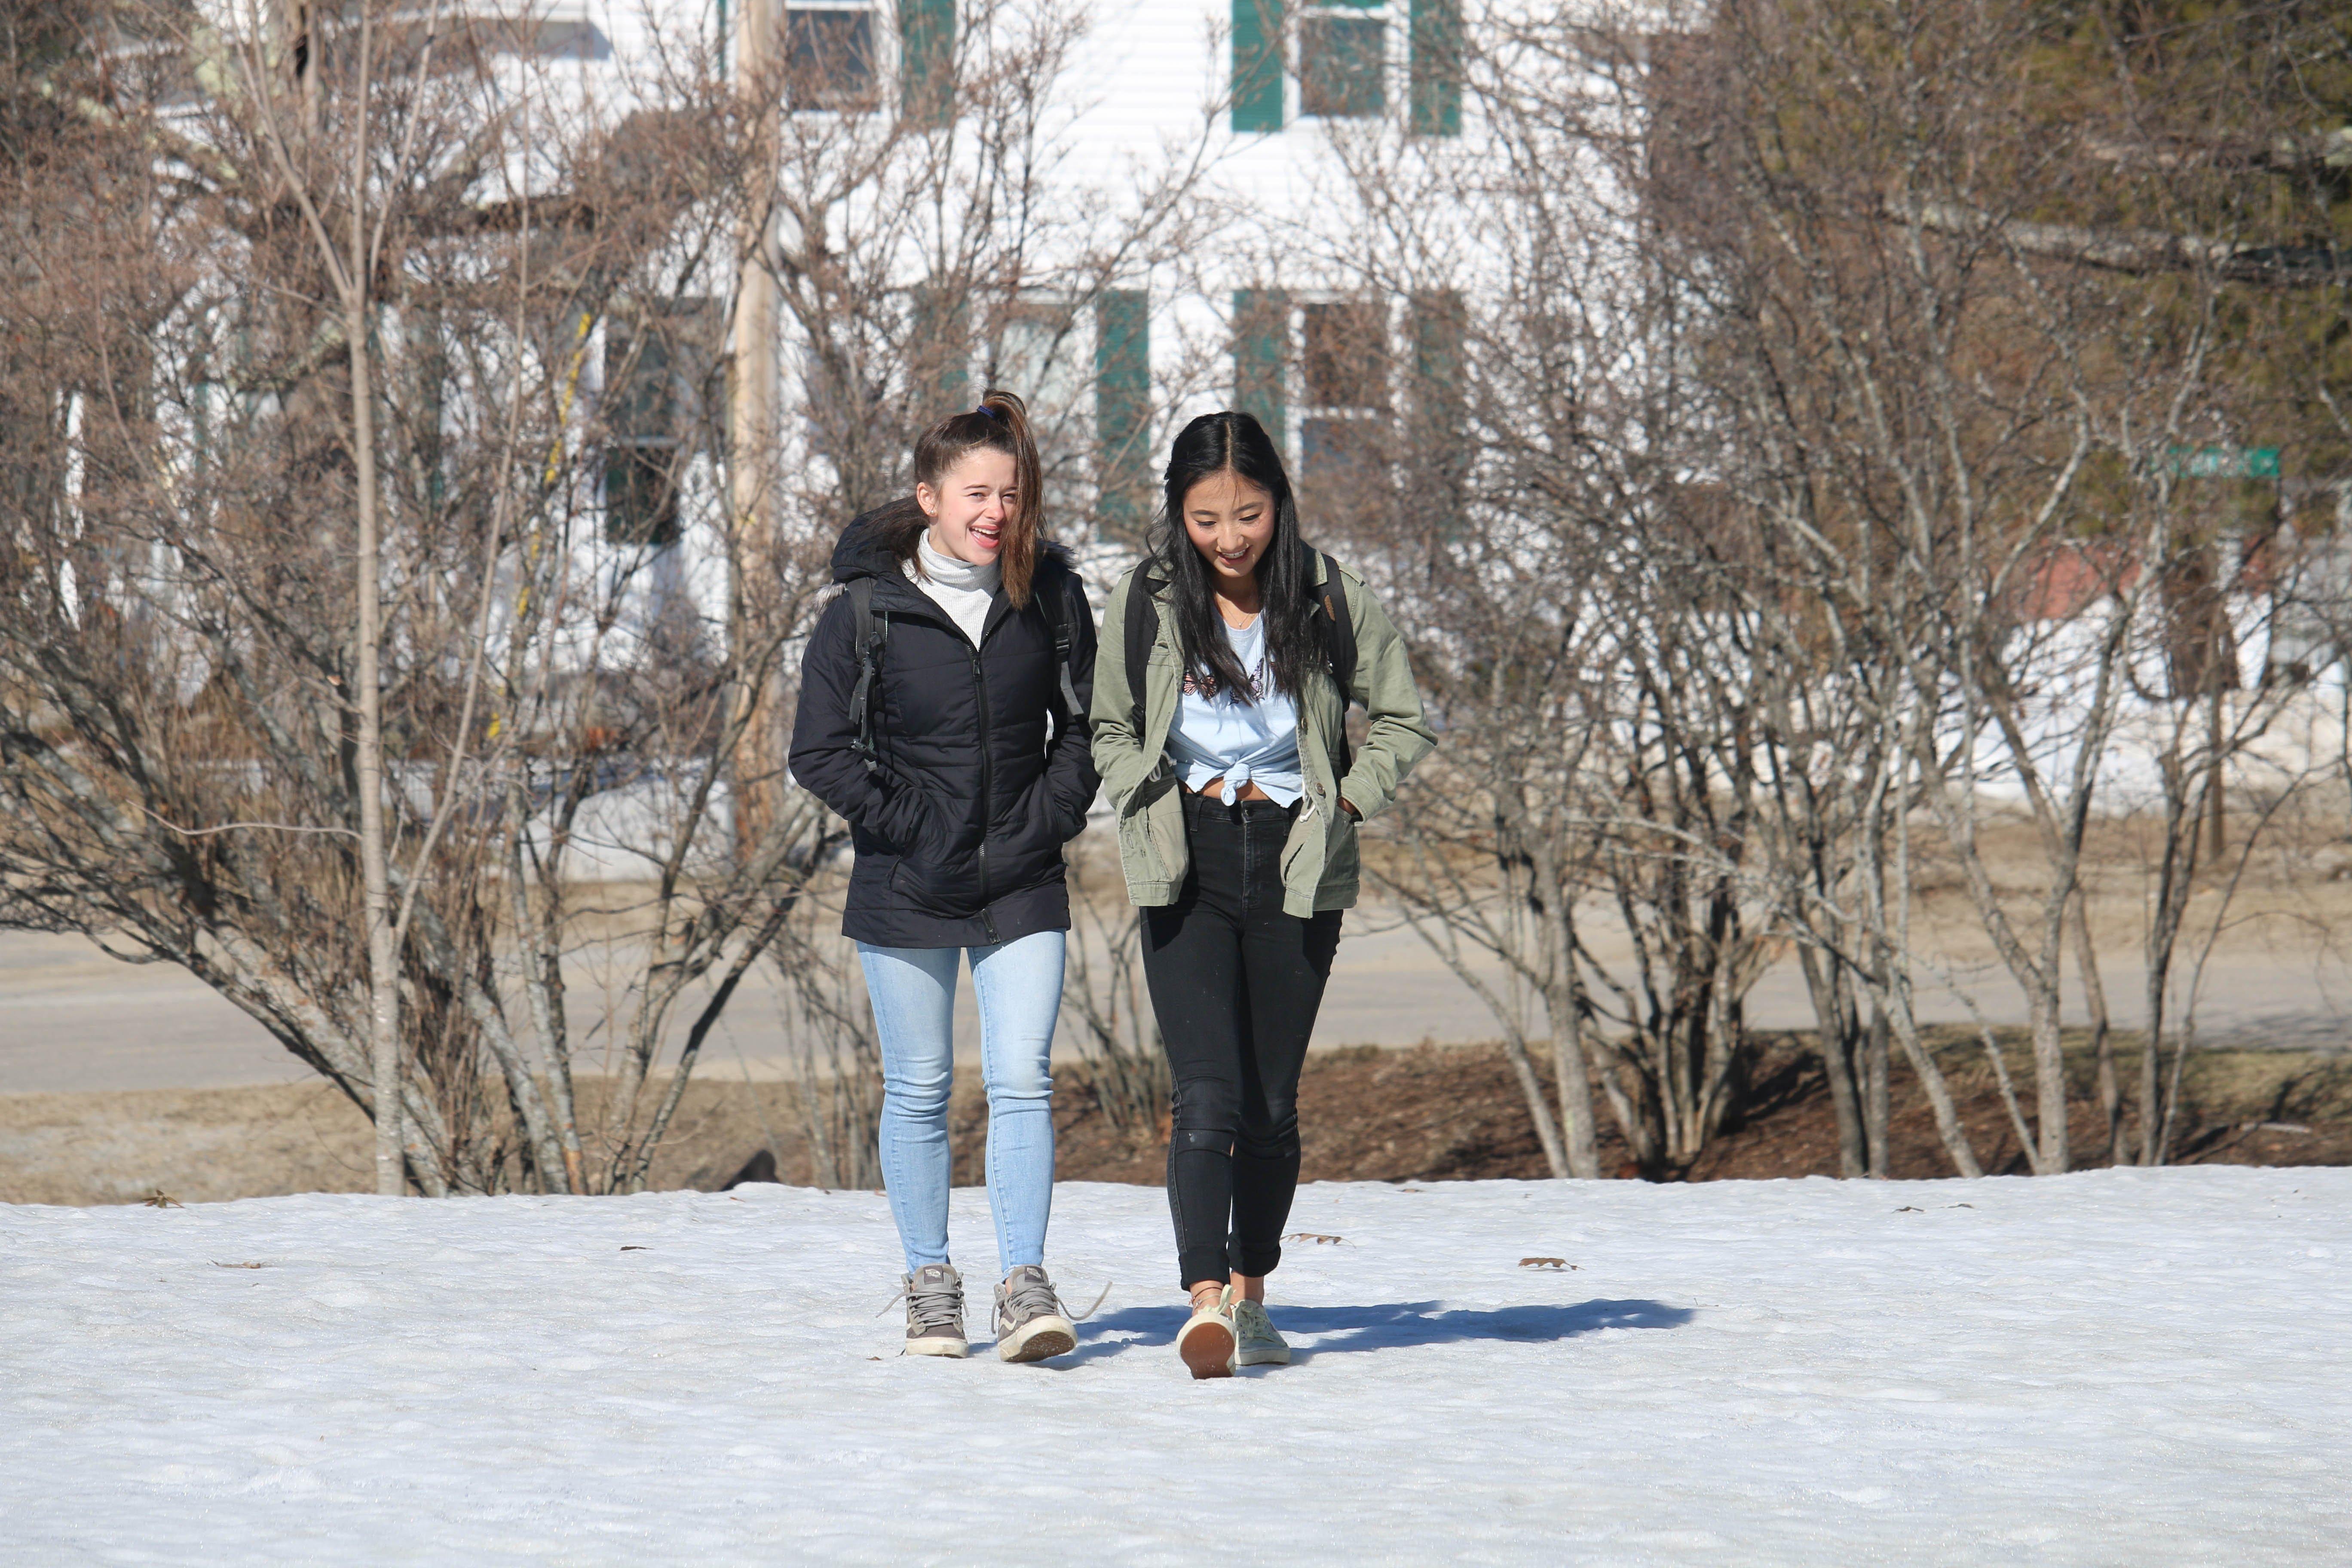 Proctor Academy Admissions Boarding School